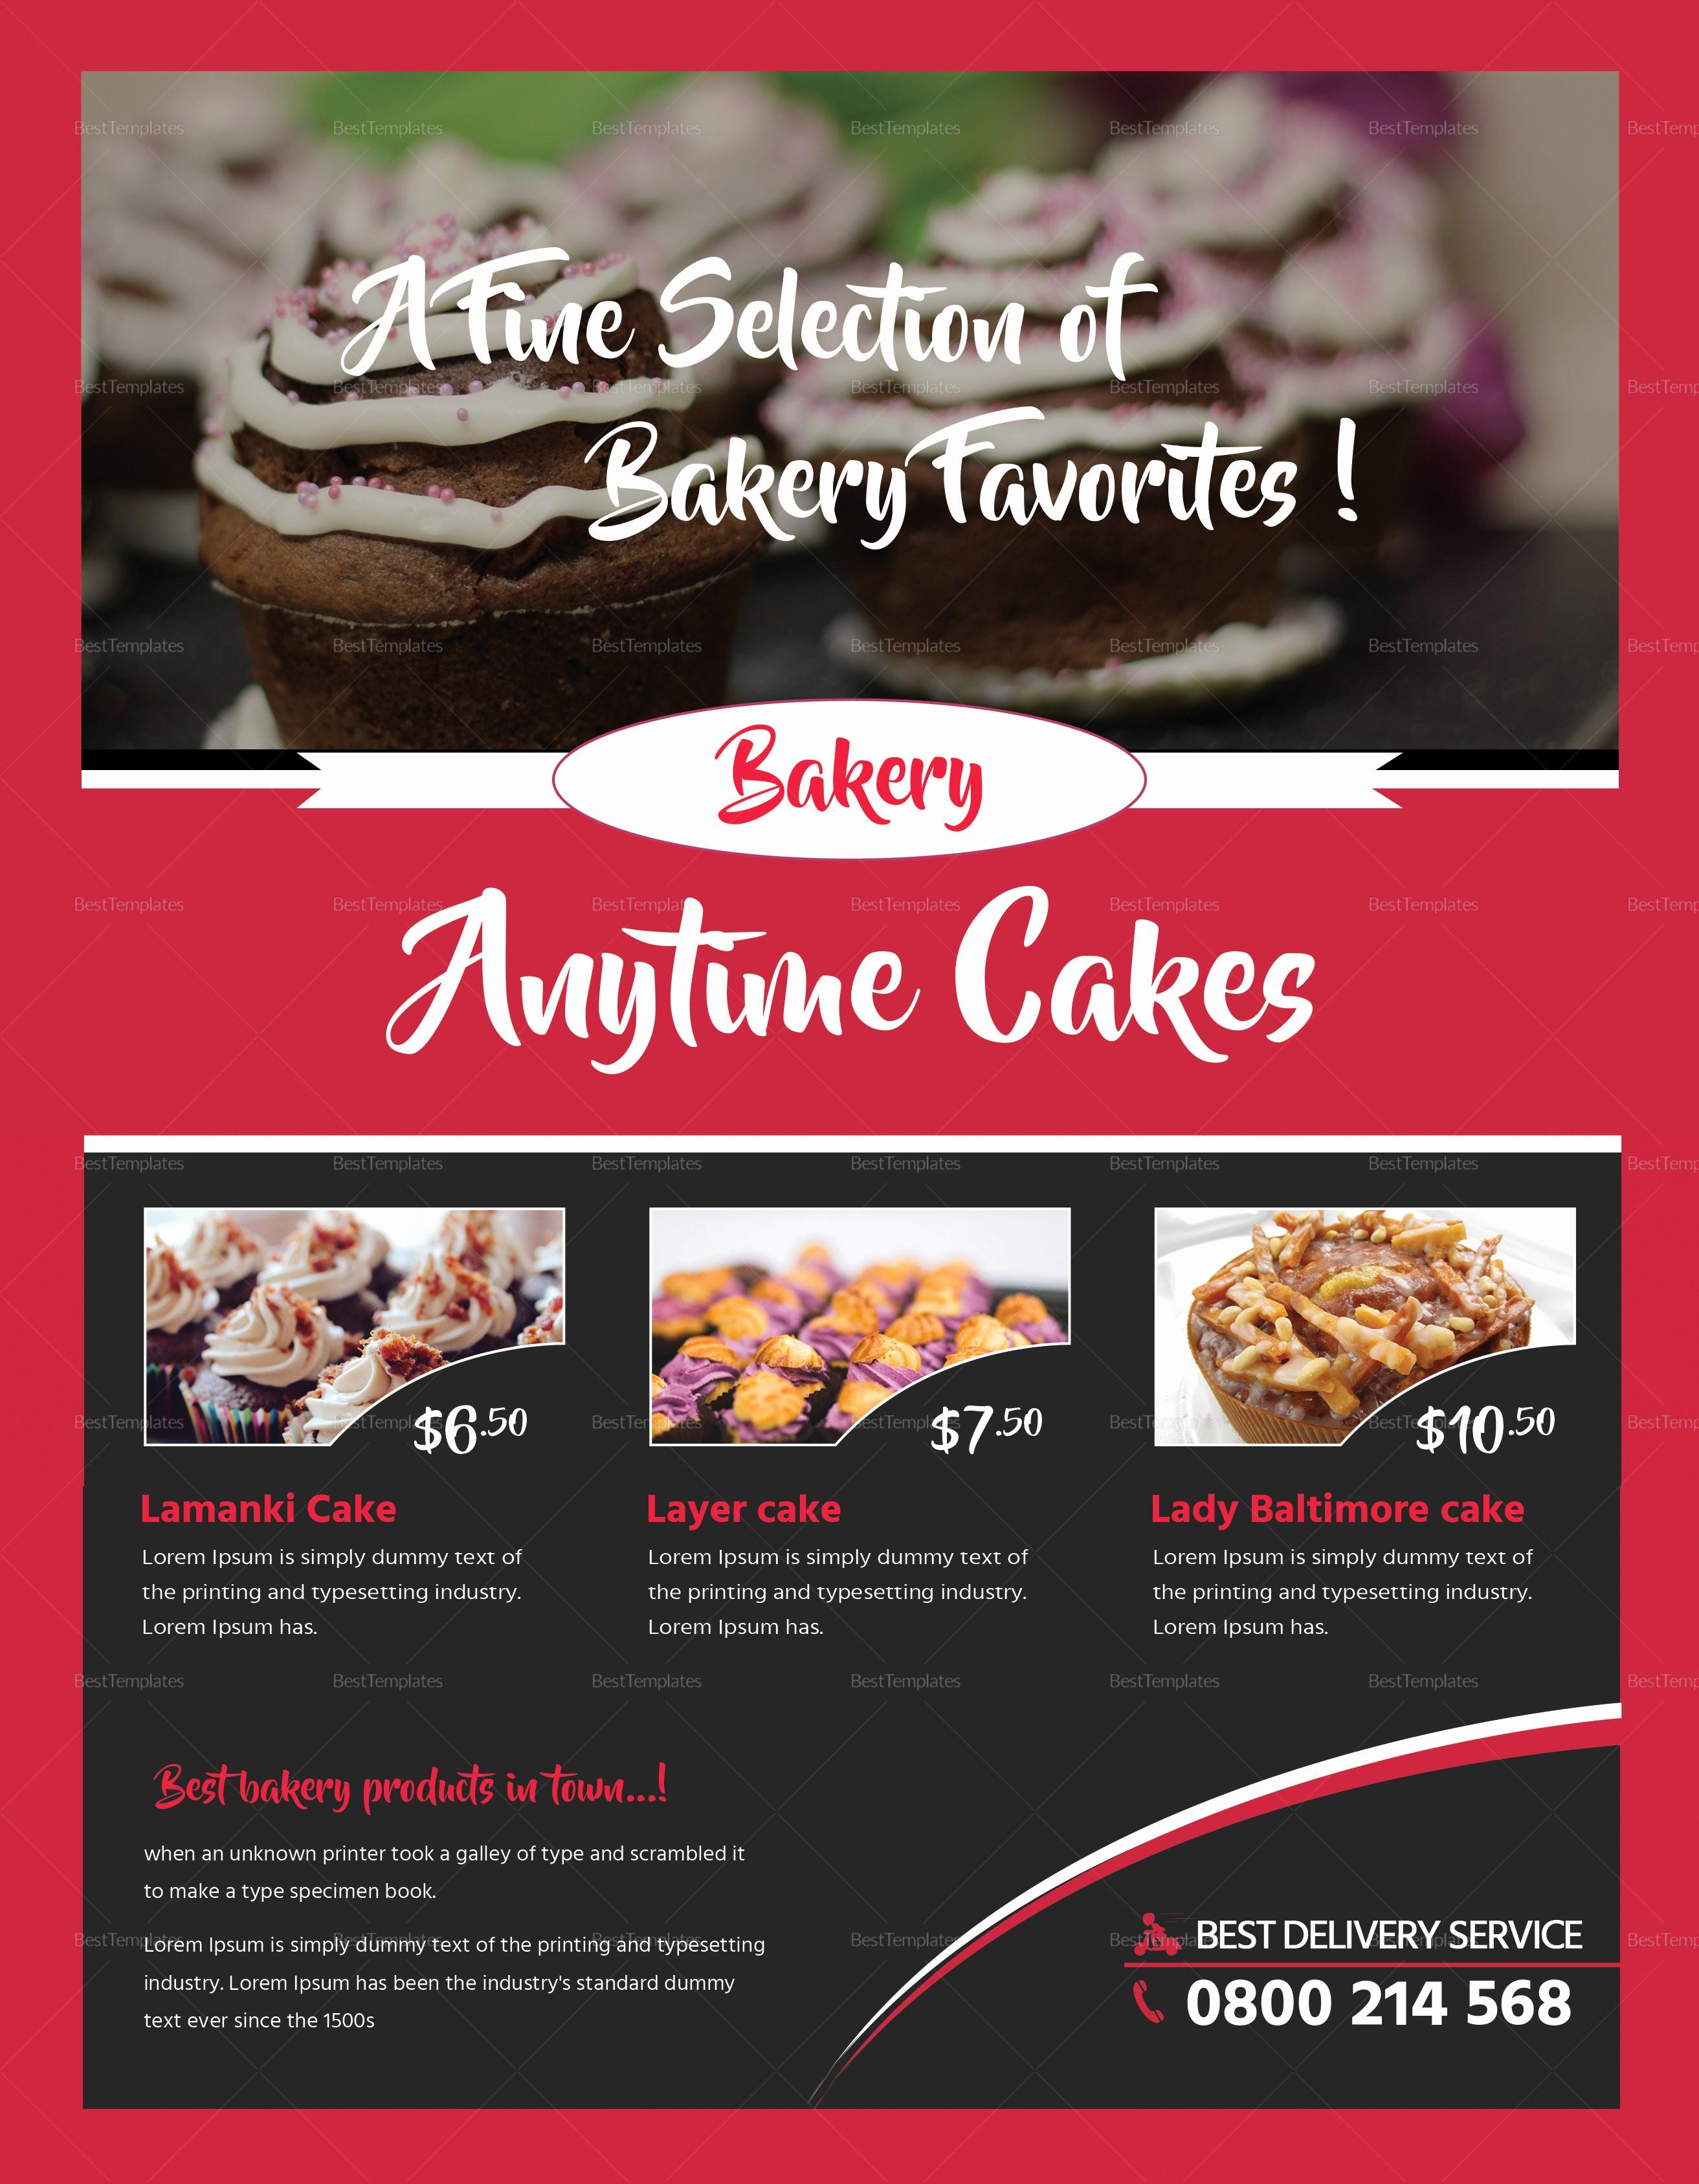 Bake Sale Flyer Template Microsoft Lovely Customizable Bake Sale Flyer Design Template In Psd Word